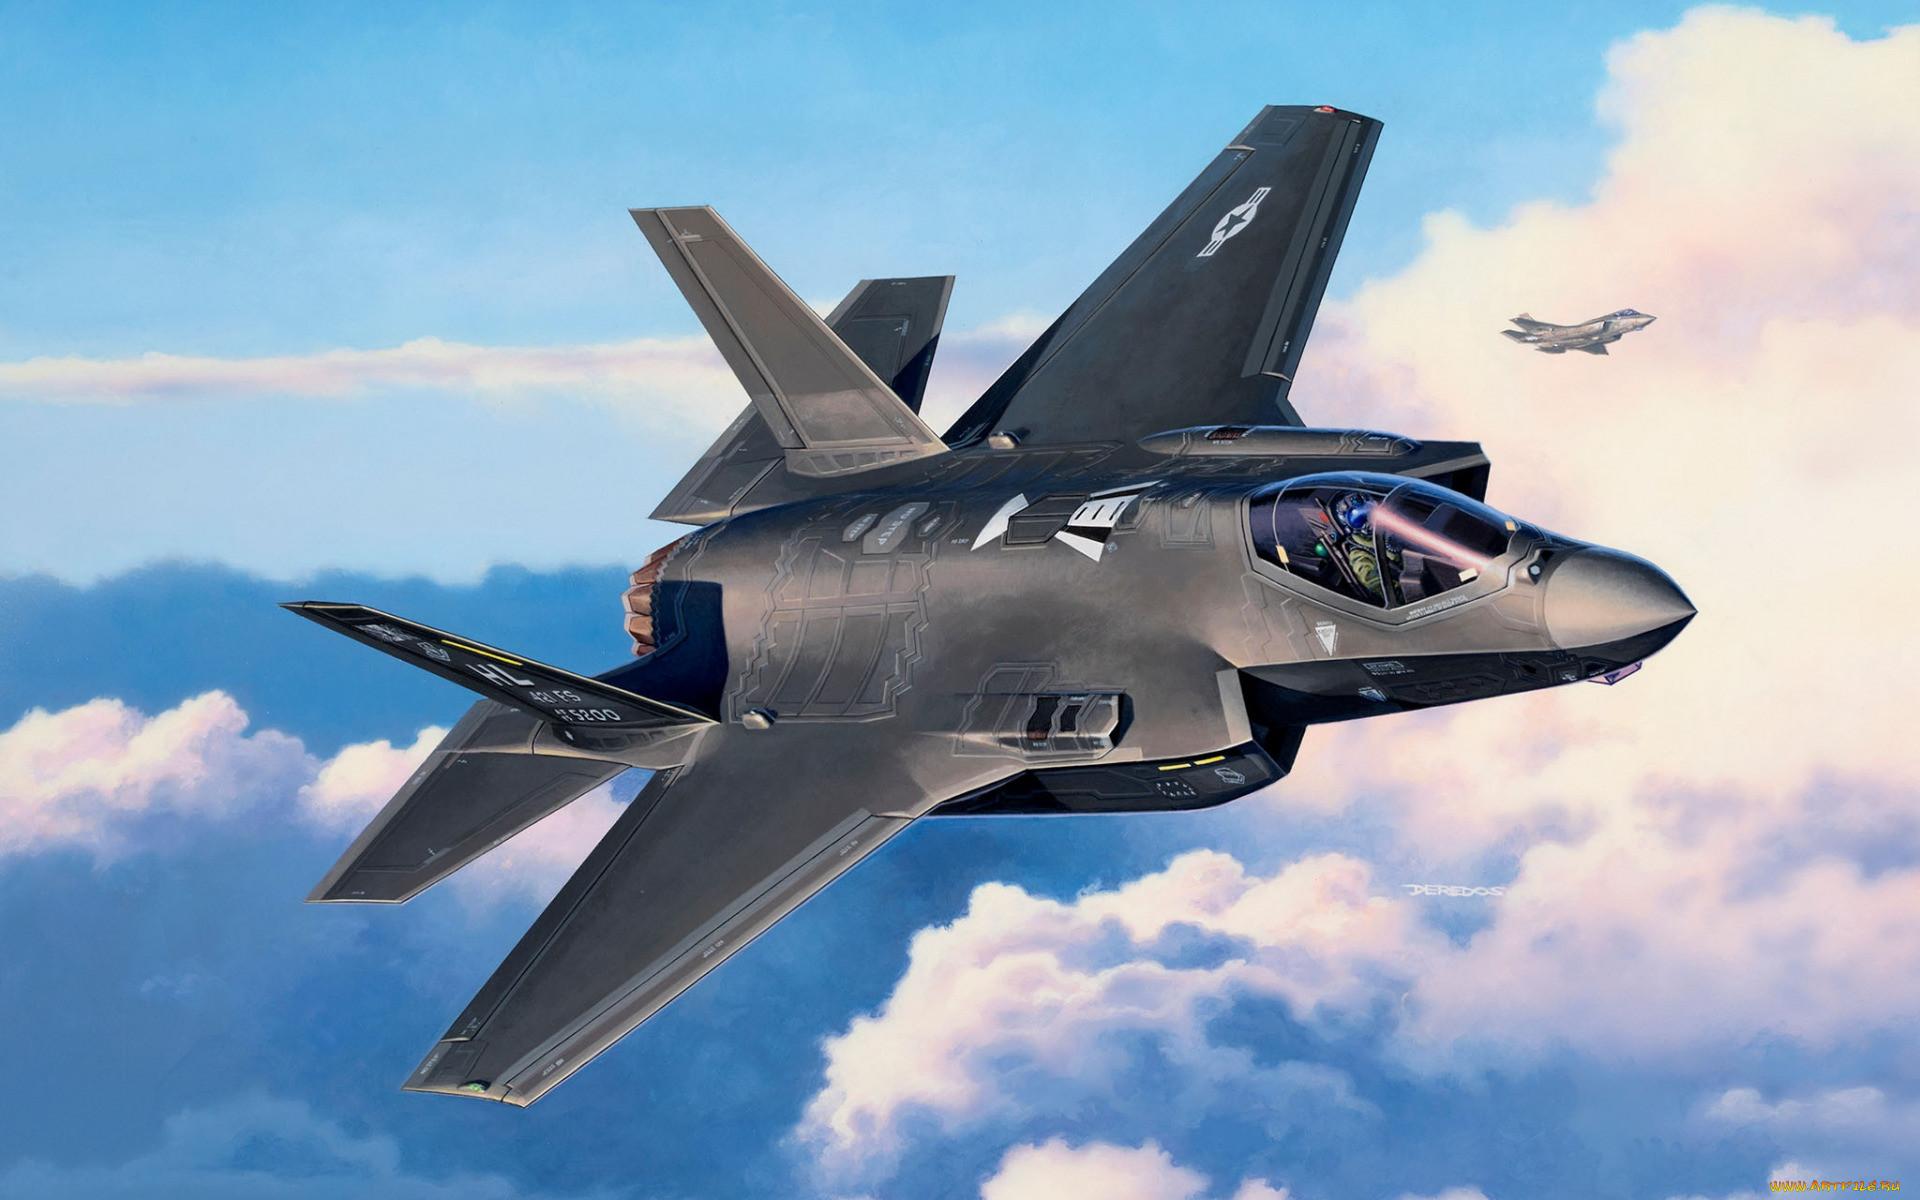 lockheed martin f-35 lightning ii, авиация, боевые самолёты, lockheed, martin, f35, lightning, ii, f35a, американский, истребитель, военный, самолет, ввс, сша, бомбардировщик, usaf